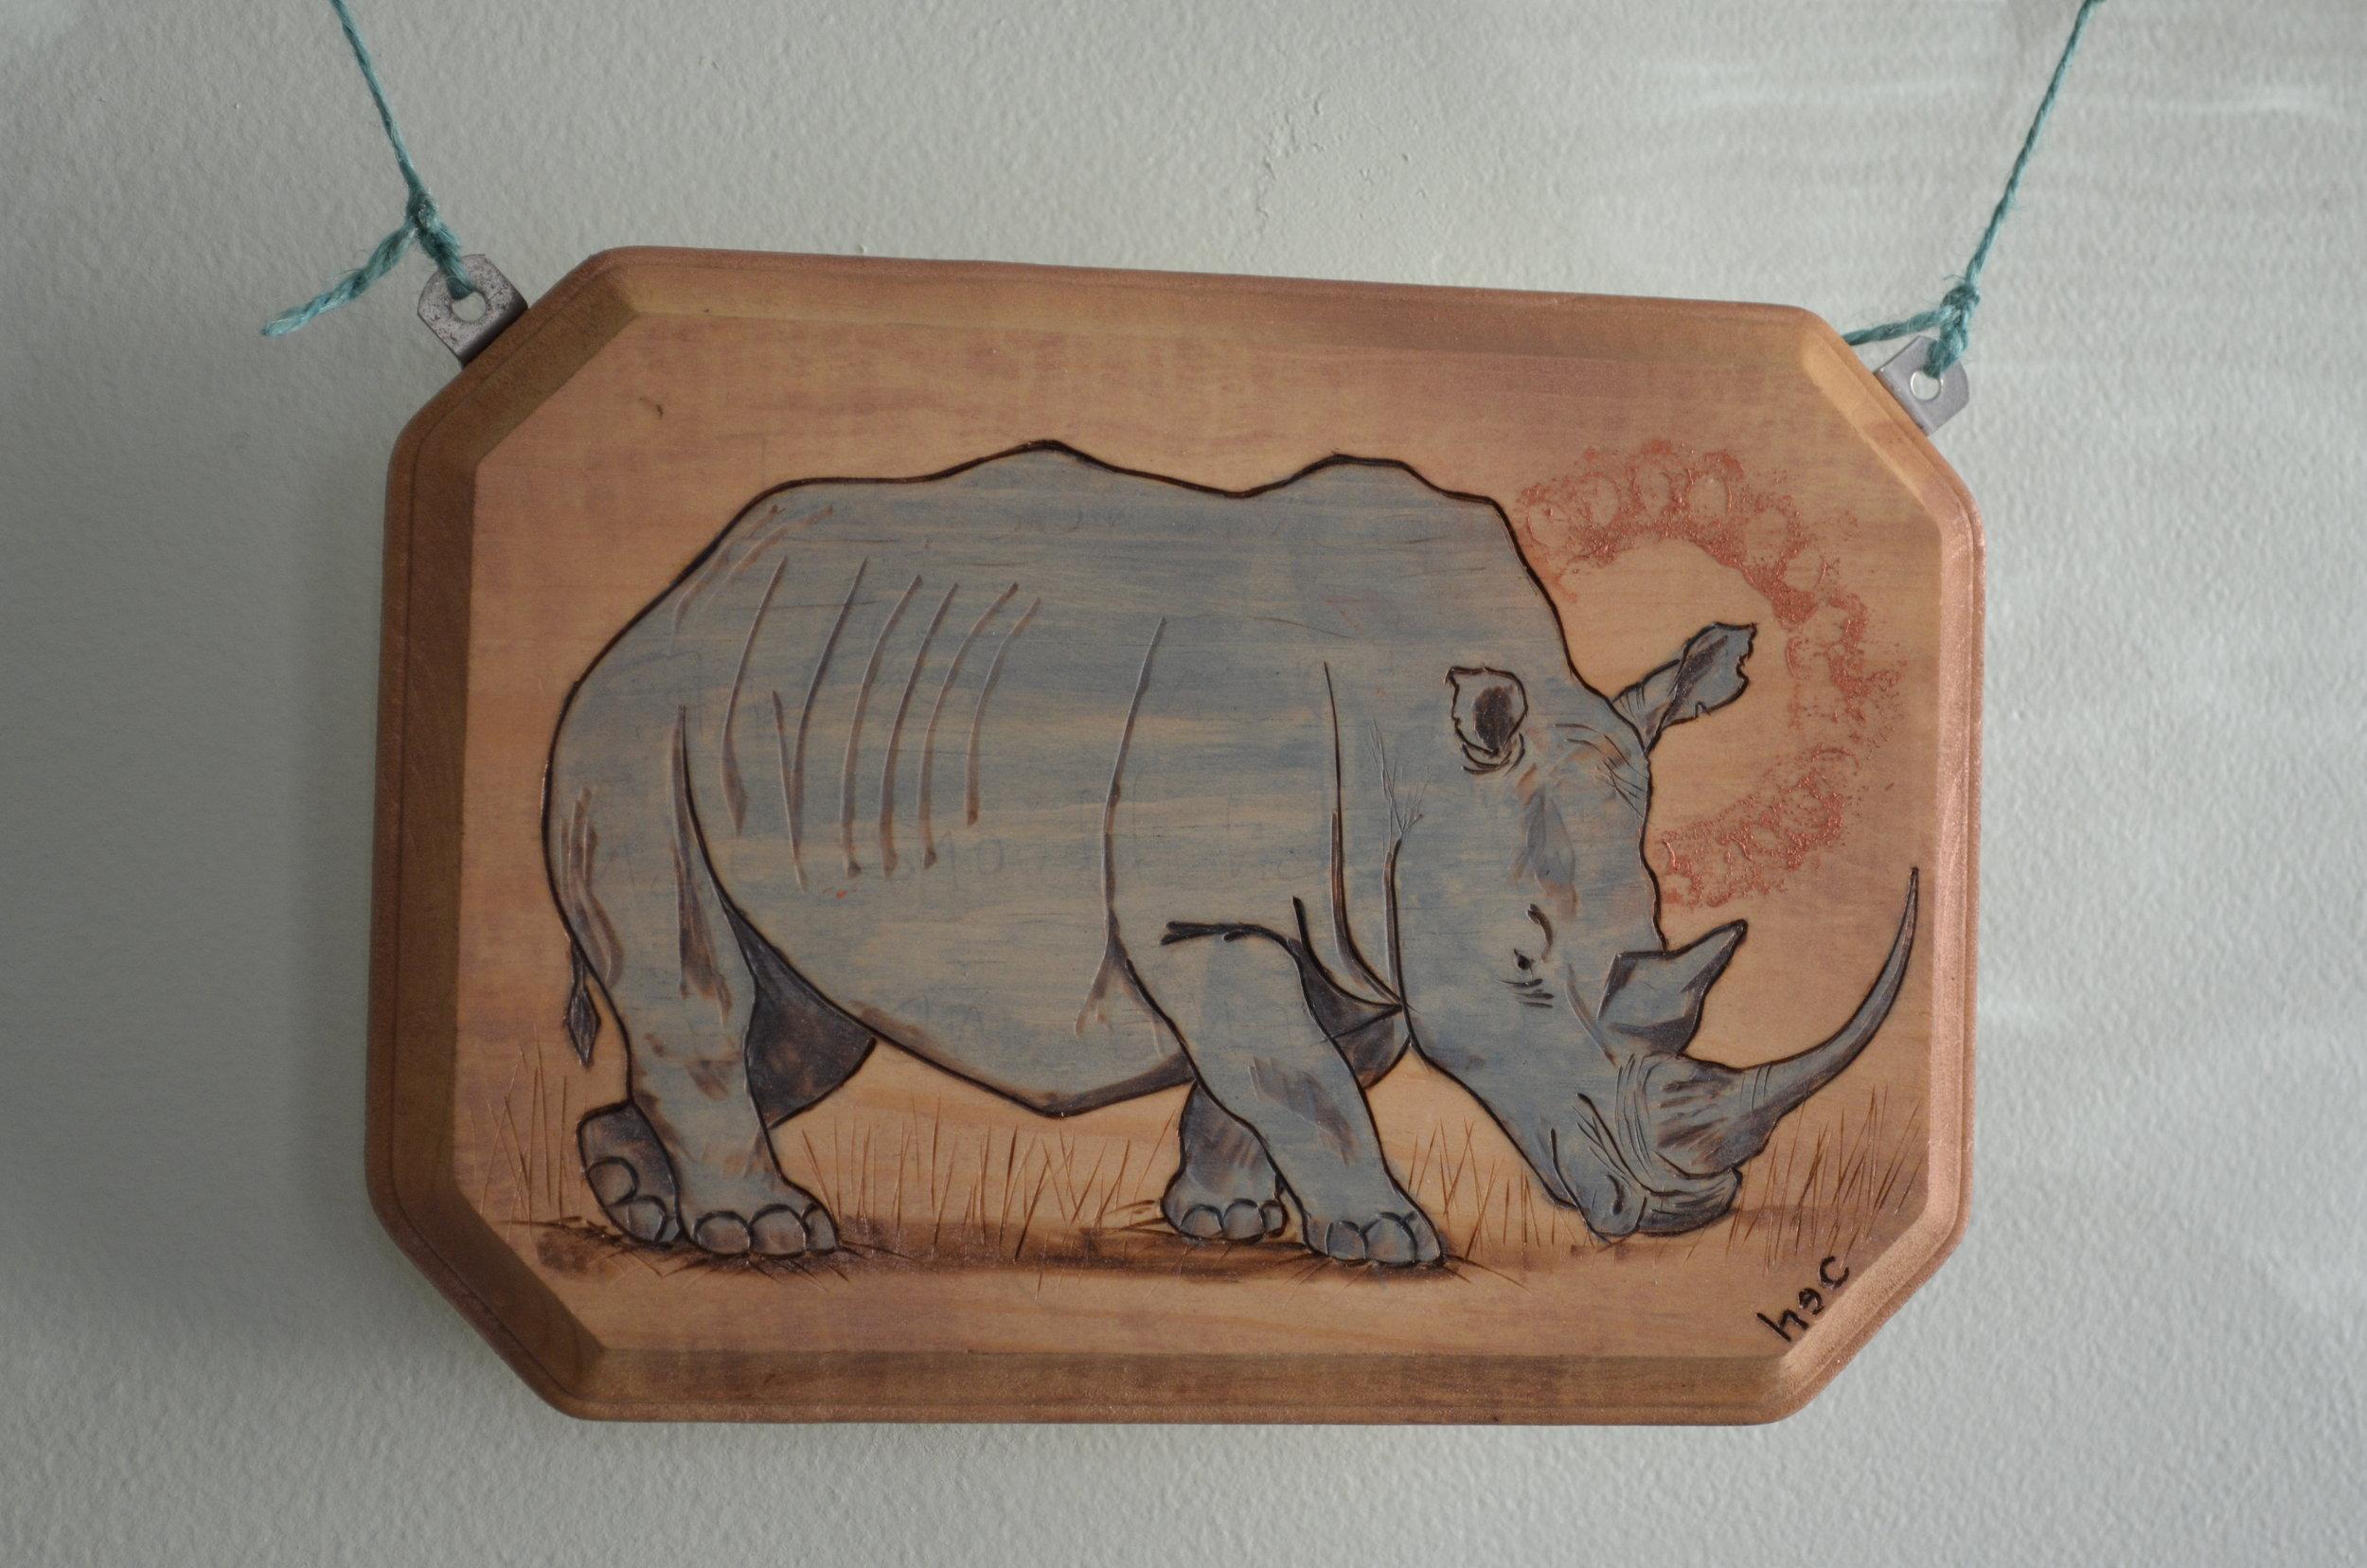 Chubby Unicorn. pyrography,wood, acrylic paint, twine, glass and wooden beads, hardware. 2016.